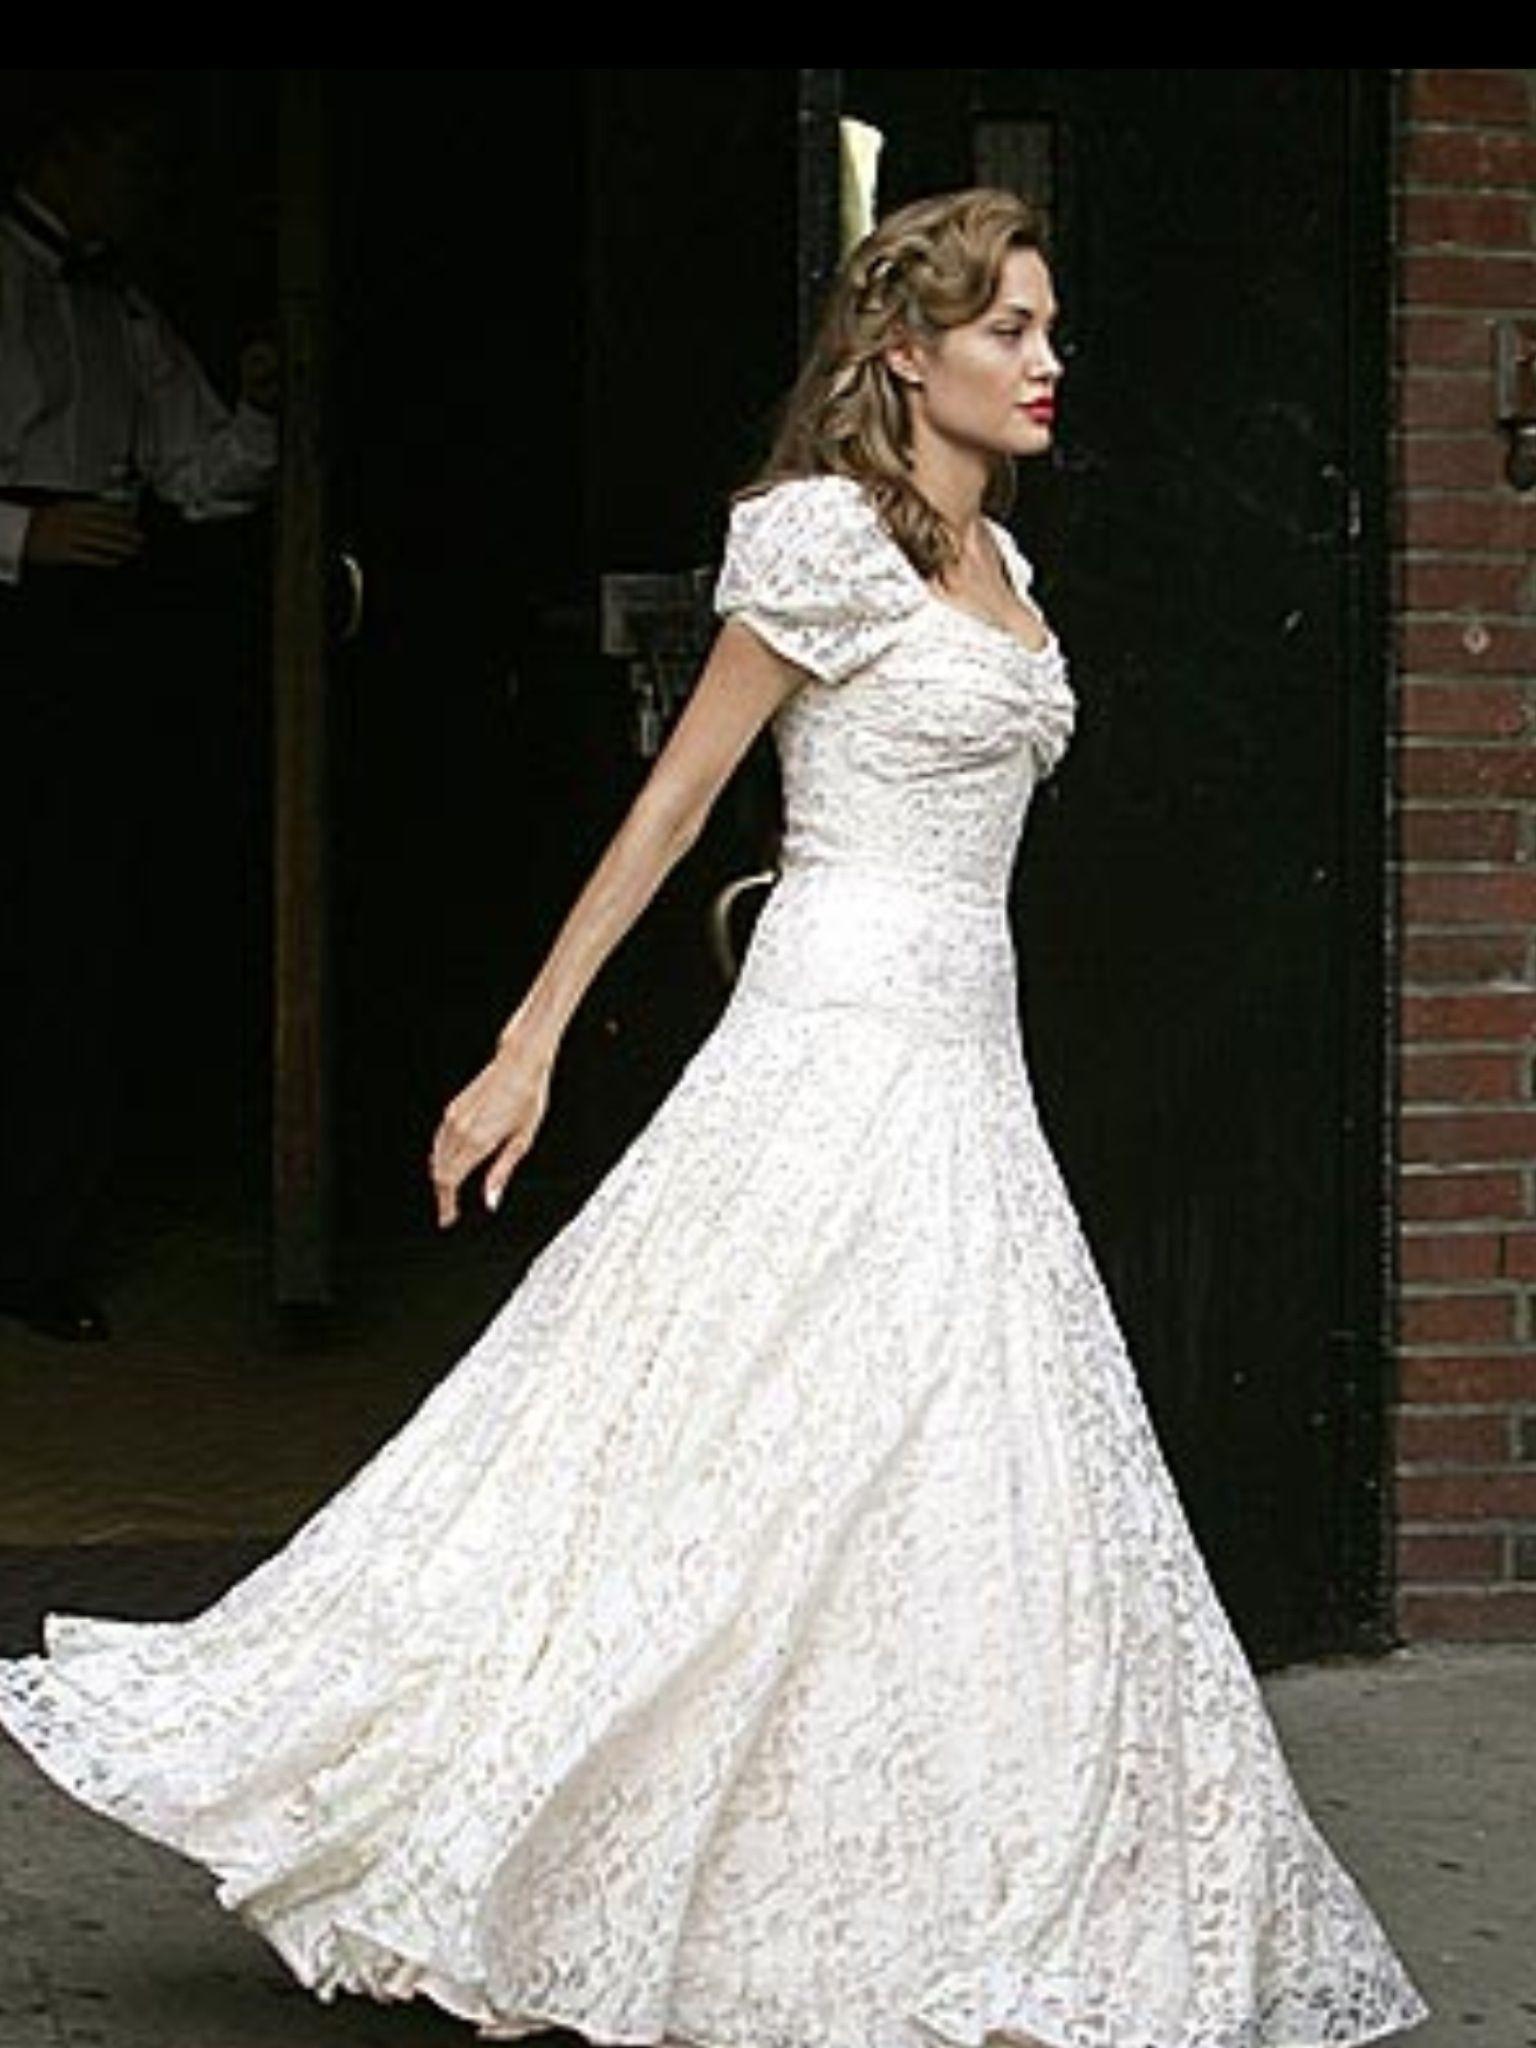 Vintage wedding dress gorgeous hey baby i think i want to marry